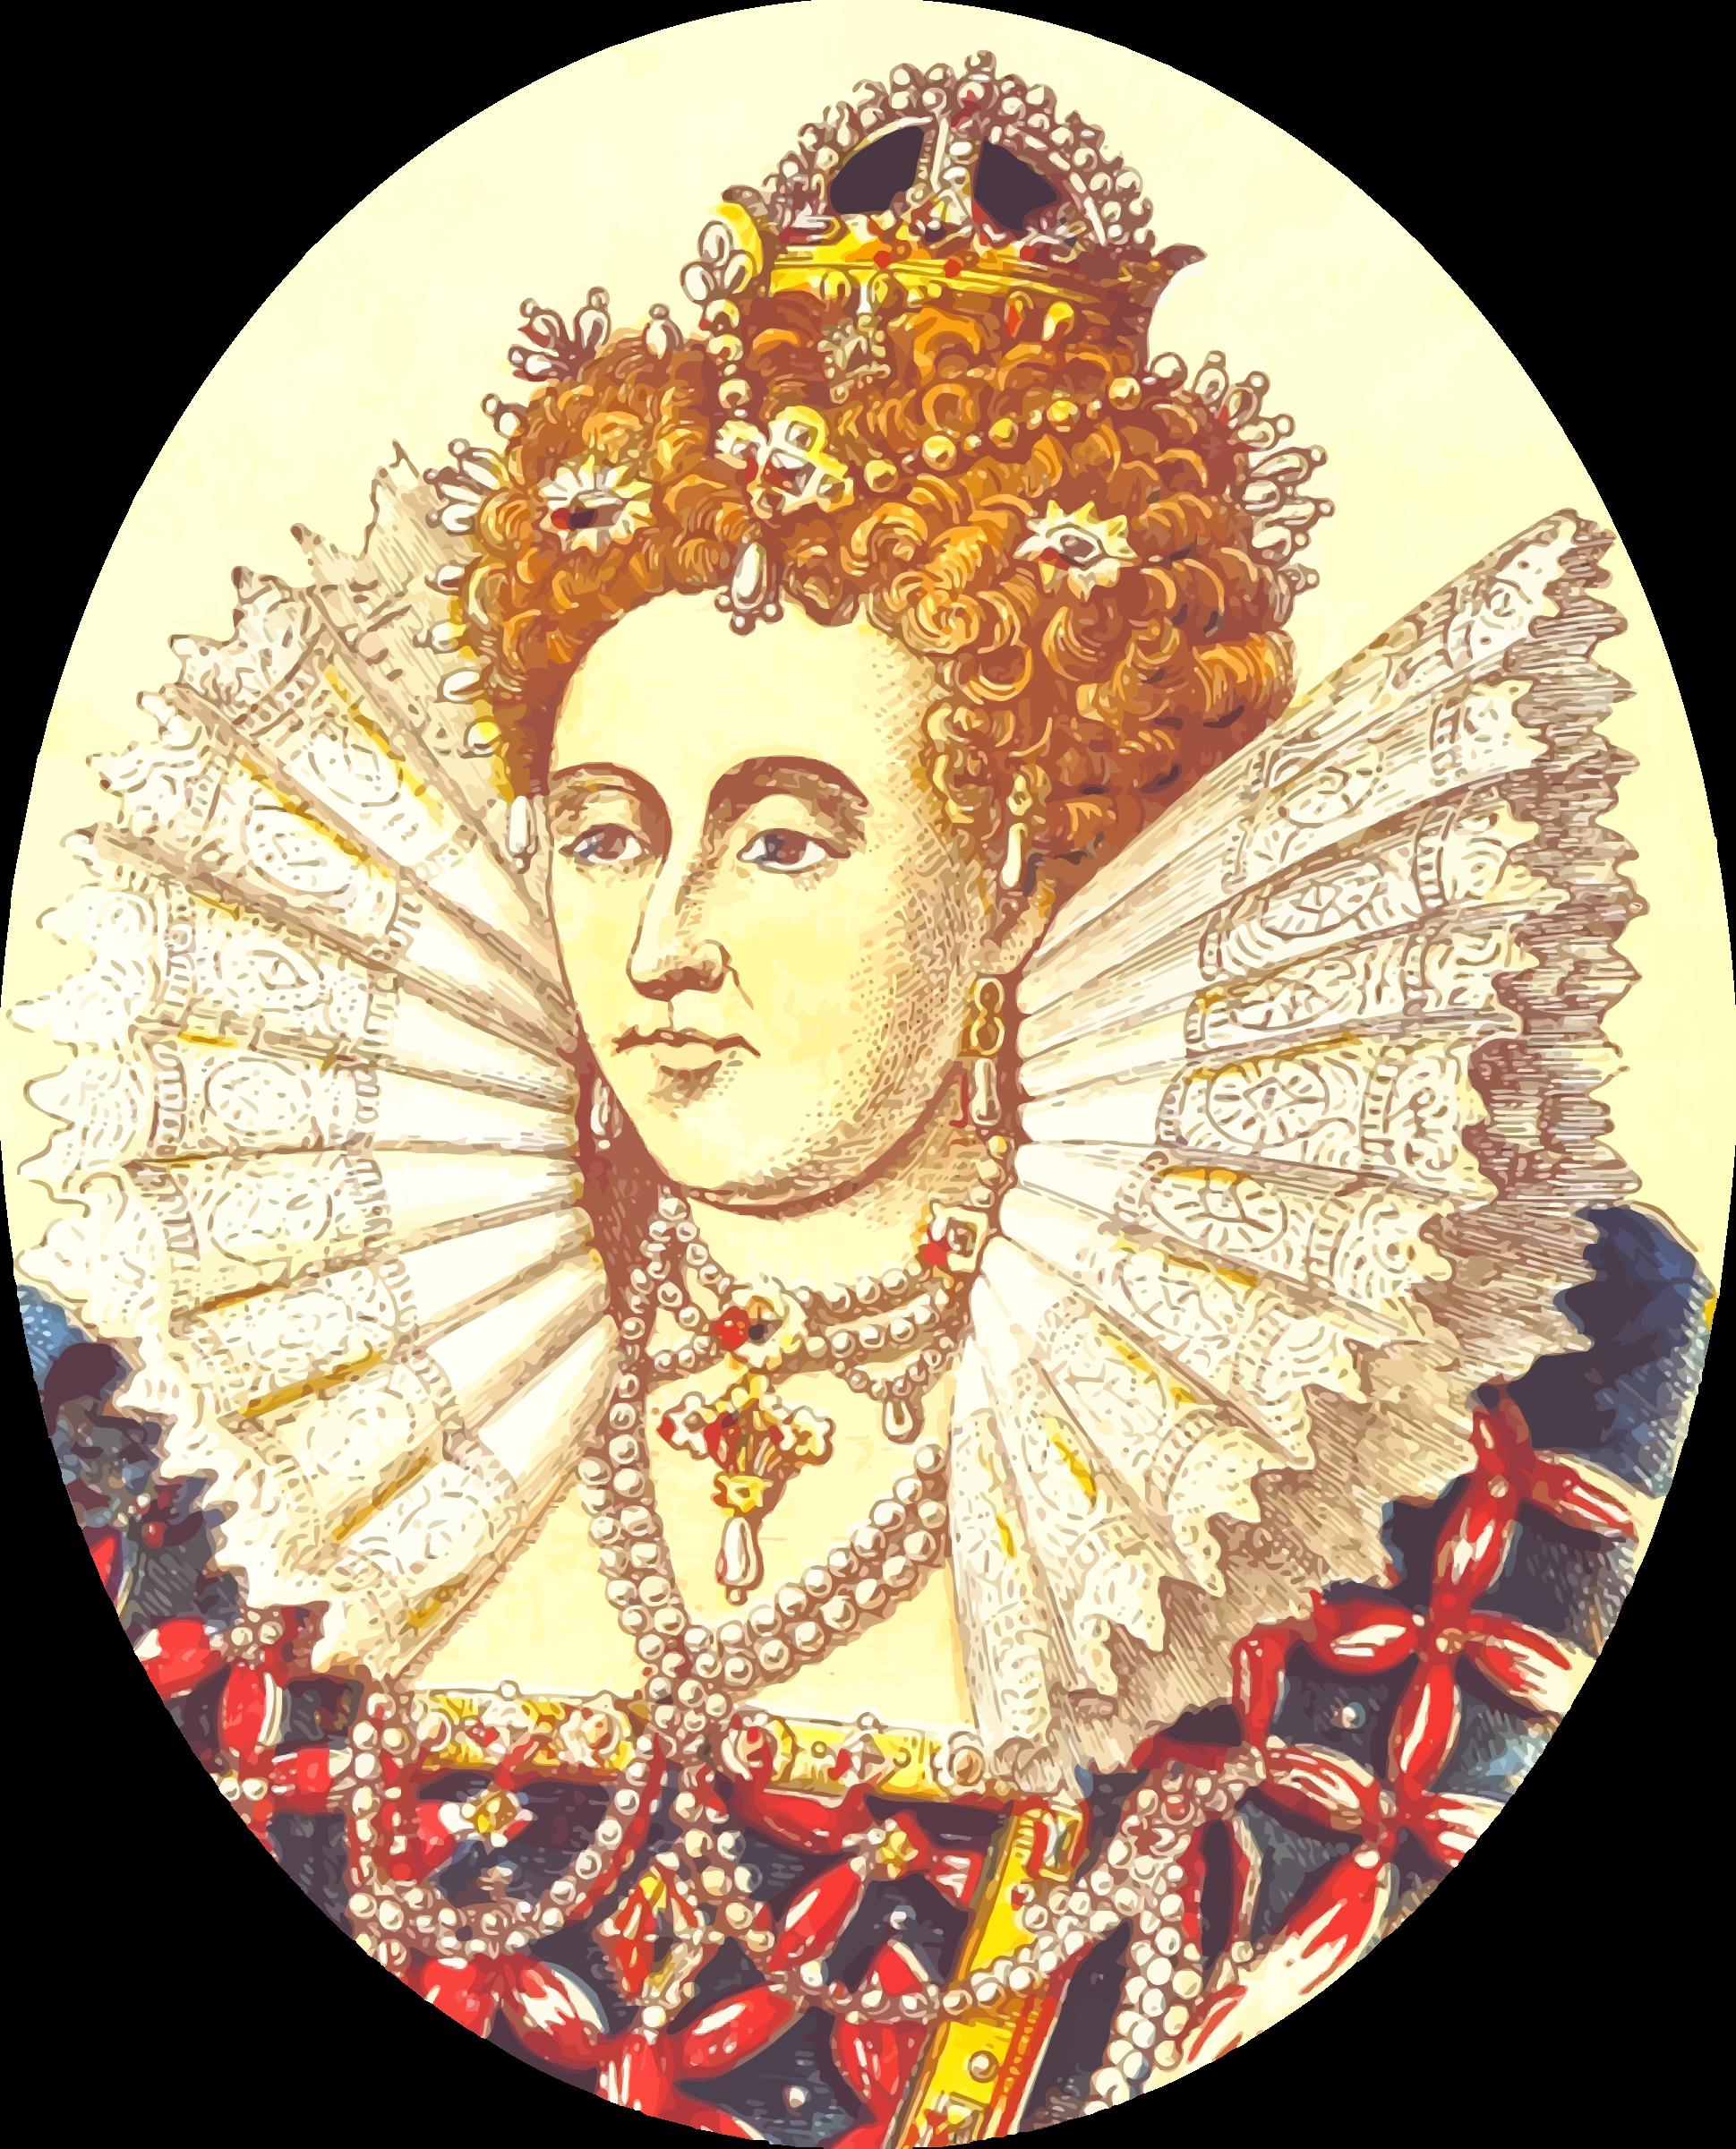 Queen clipart queen royalty. Elizabeth i version big